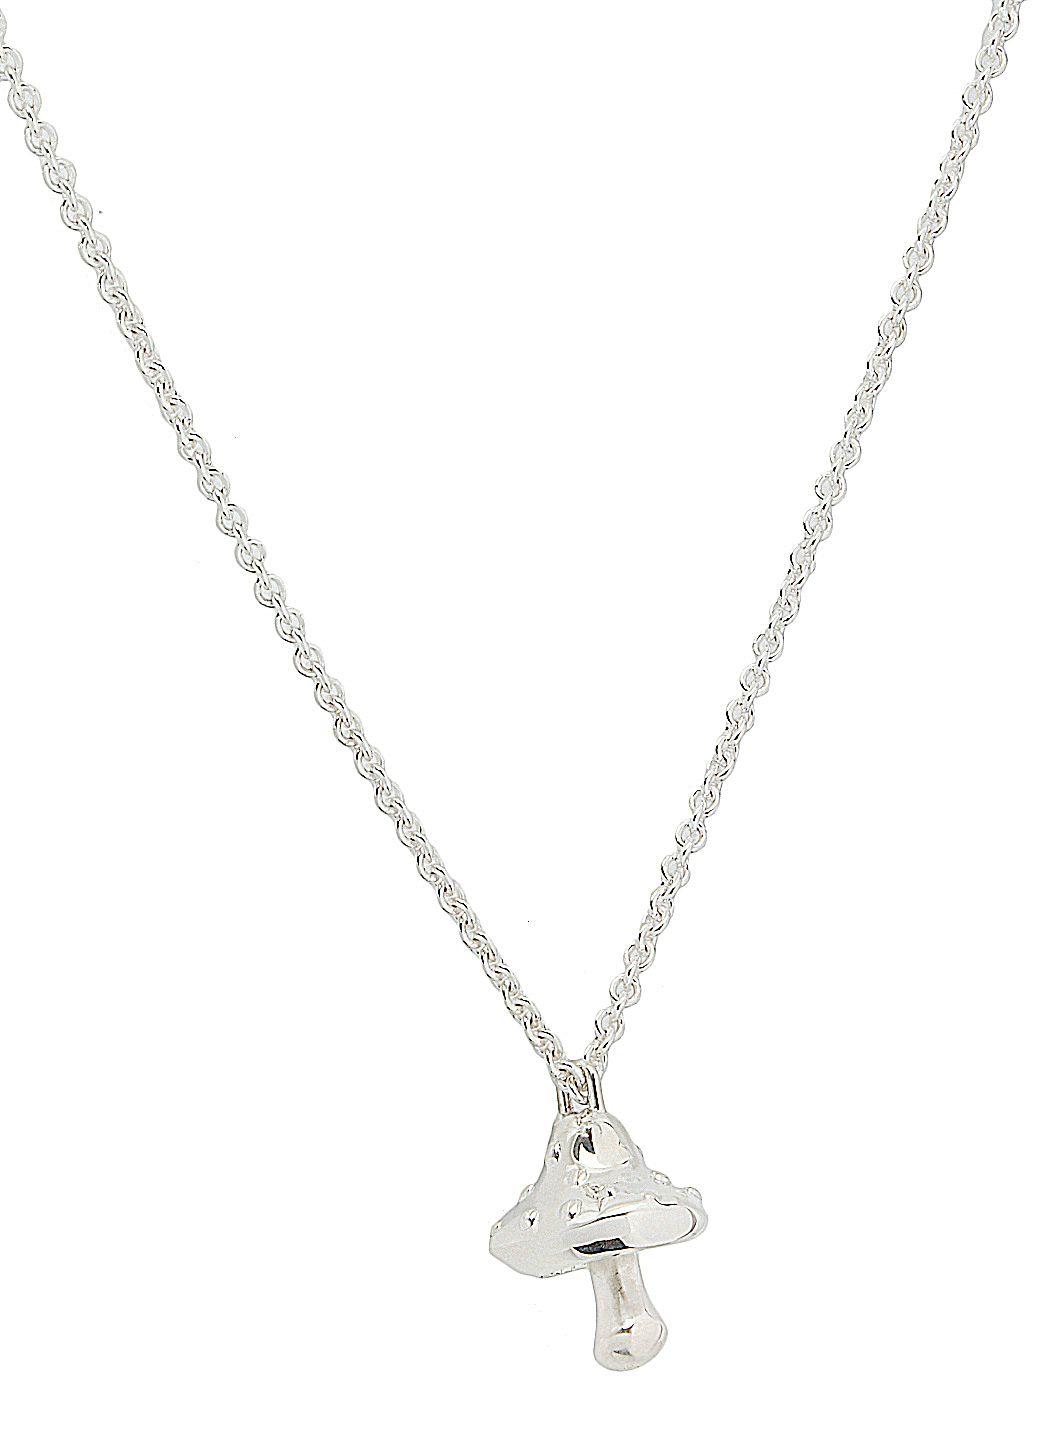 Mushroom charm necklace